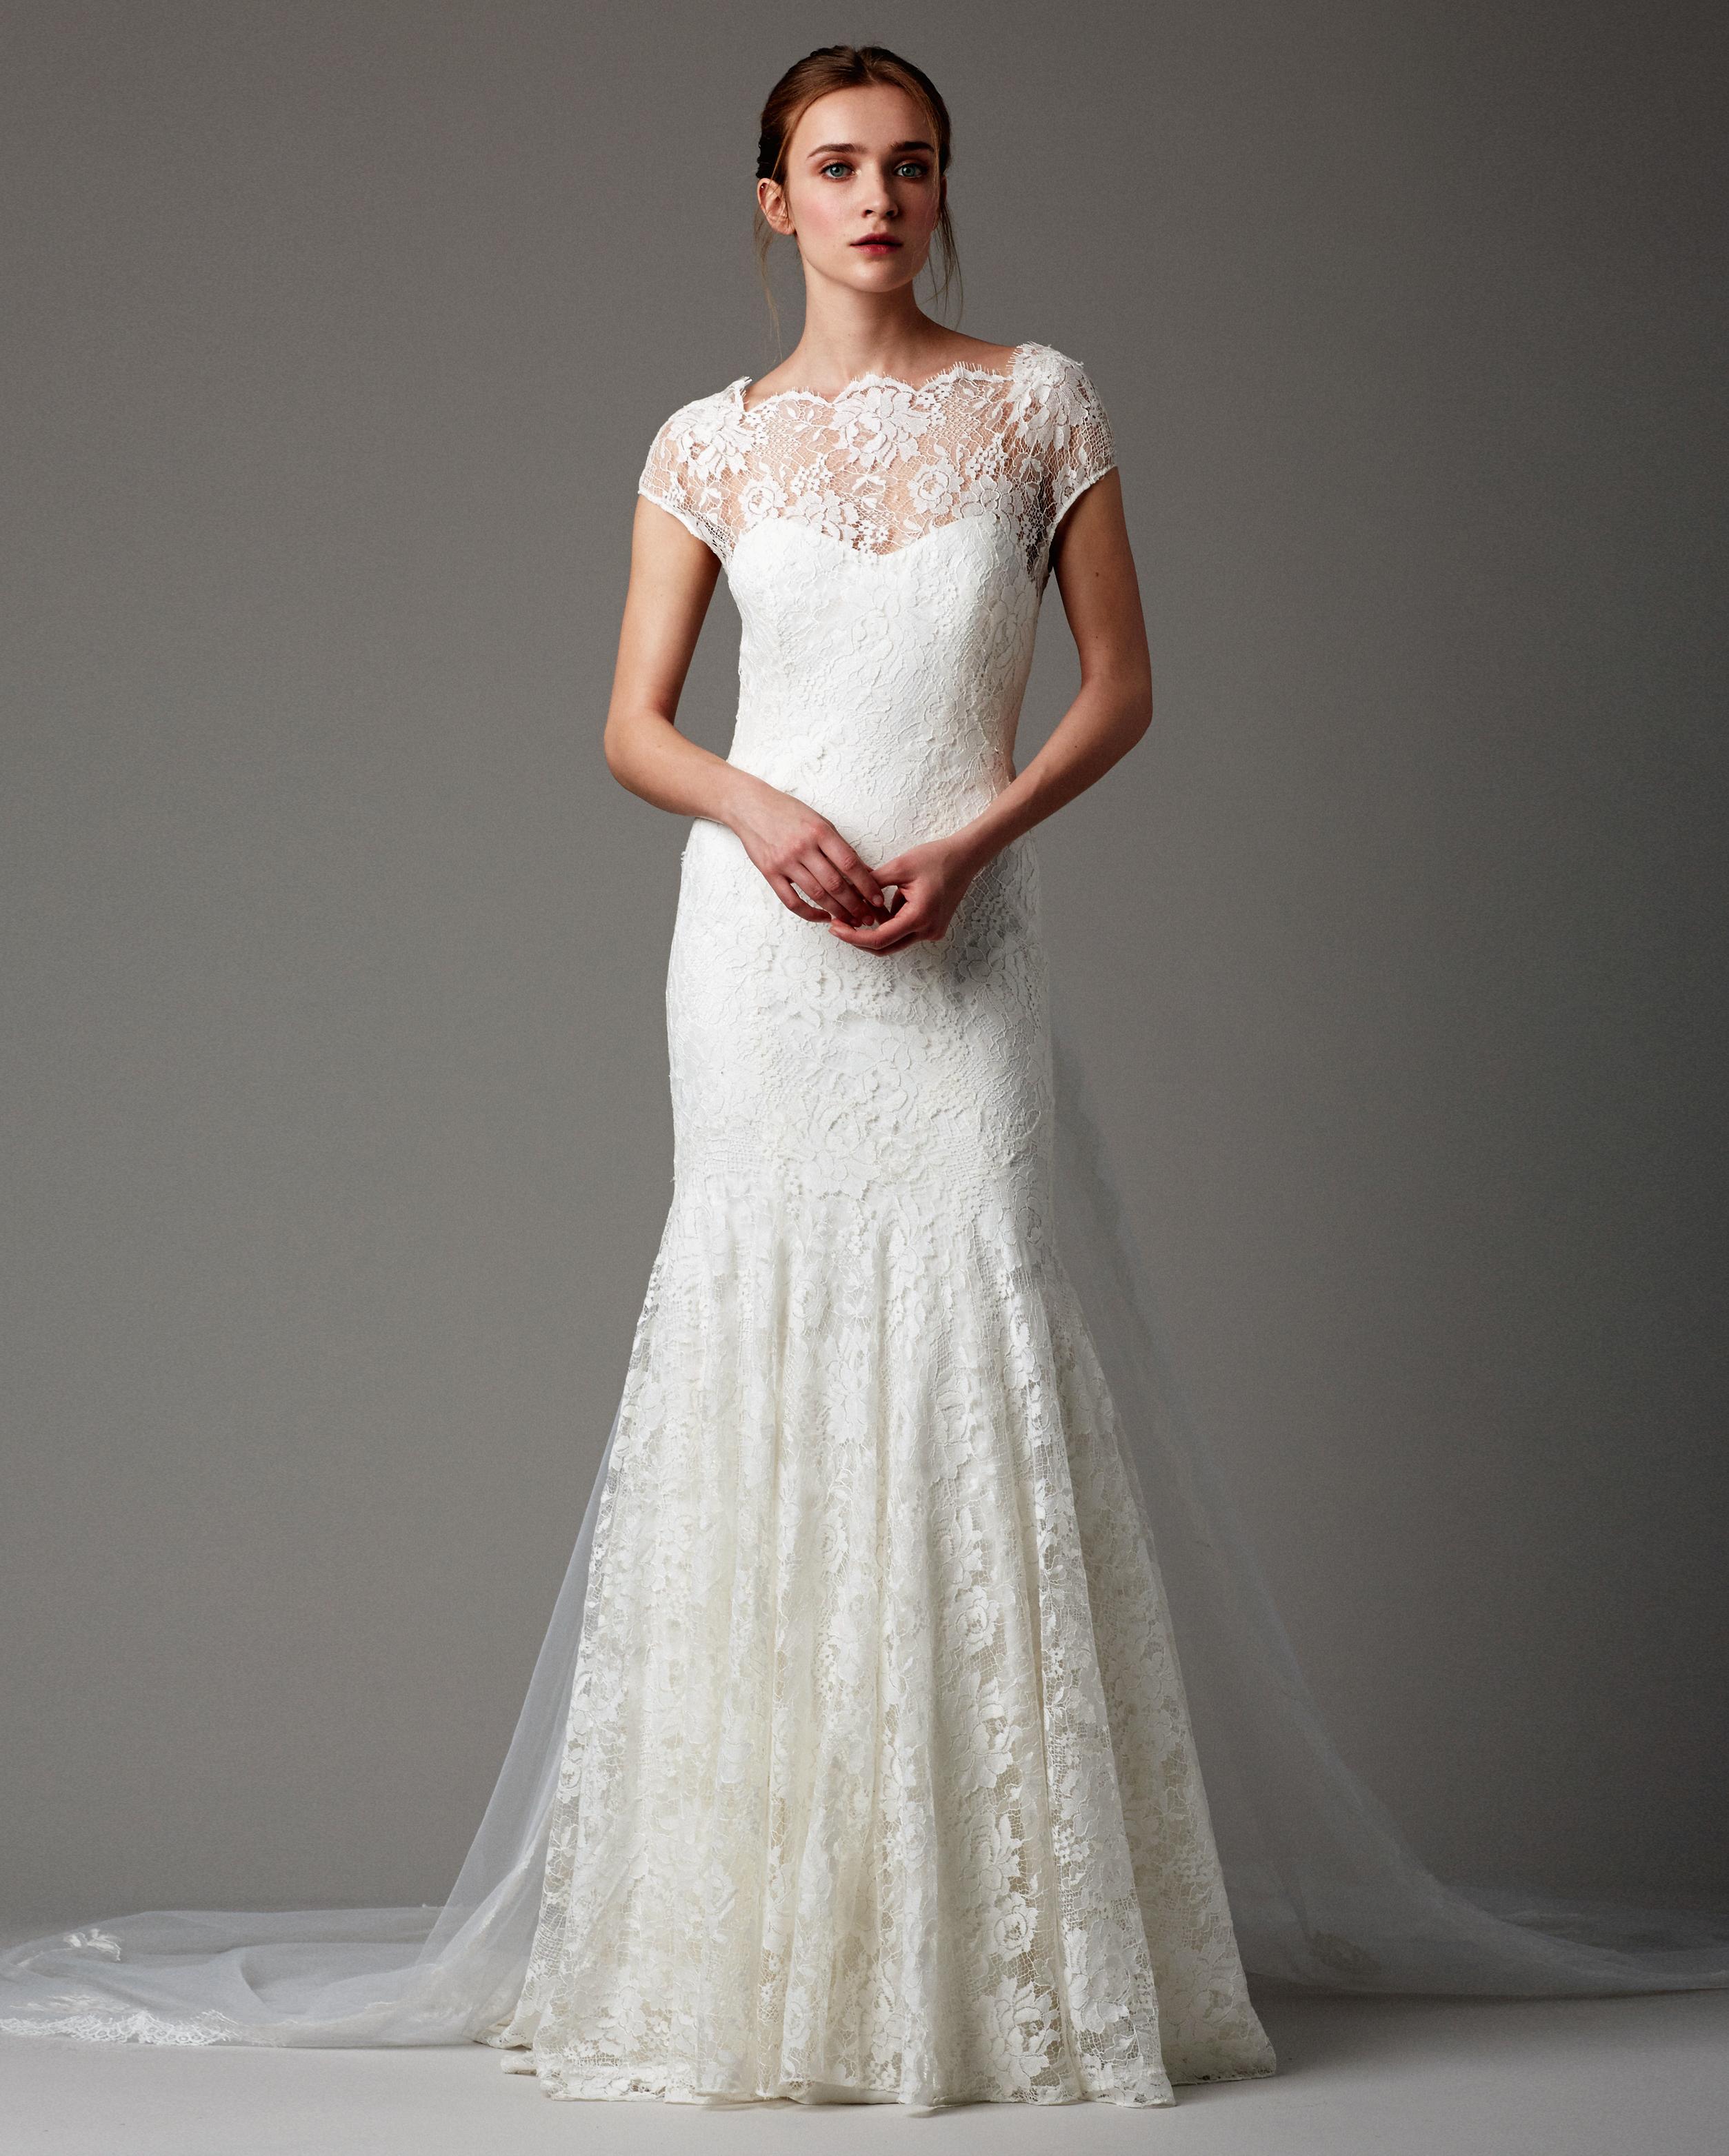 50 Wedding Dresses for Every Bride\u0027s State Pride